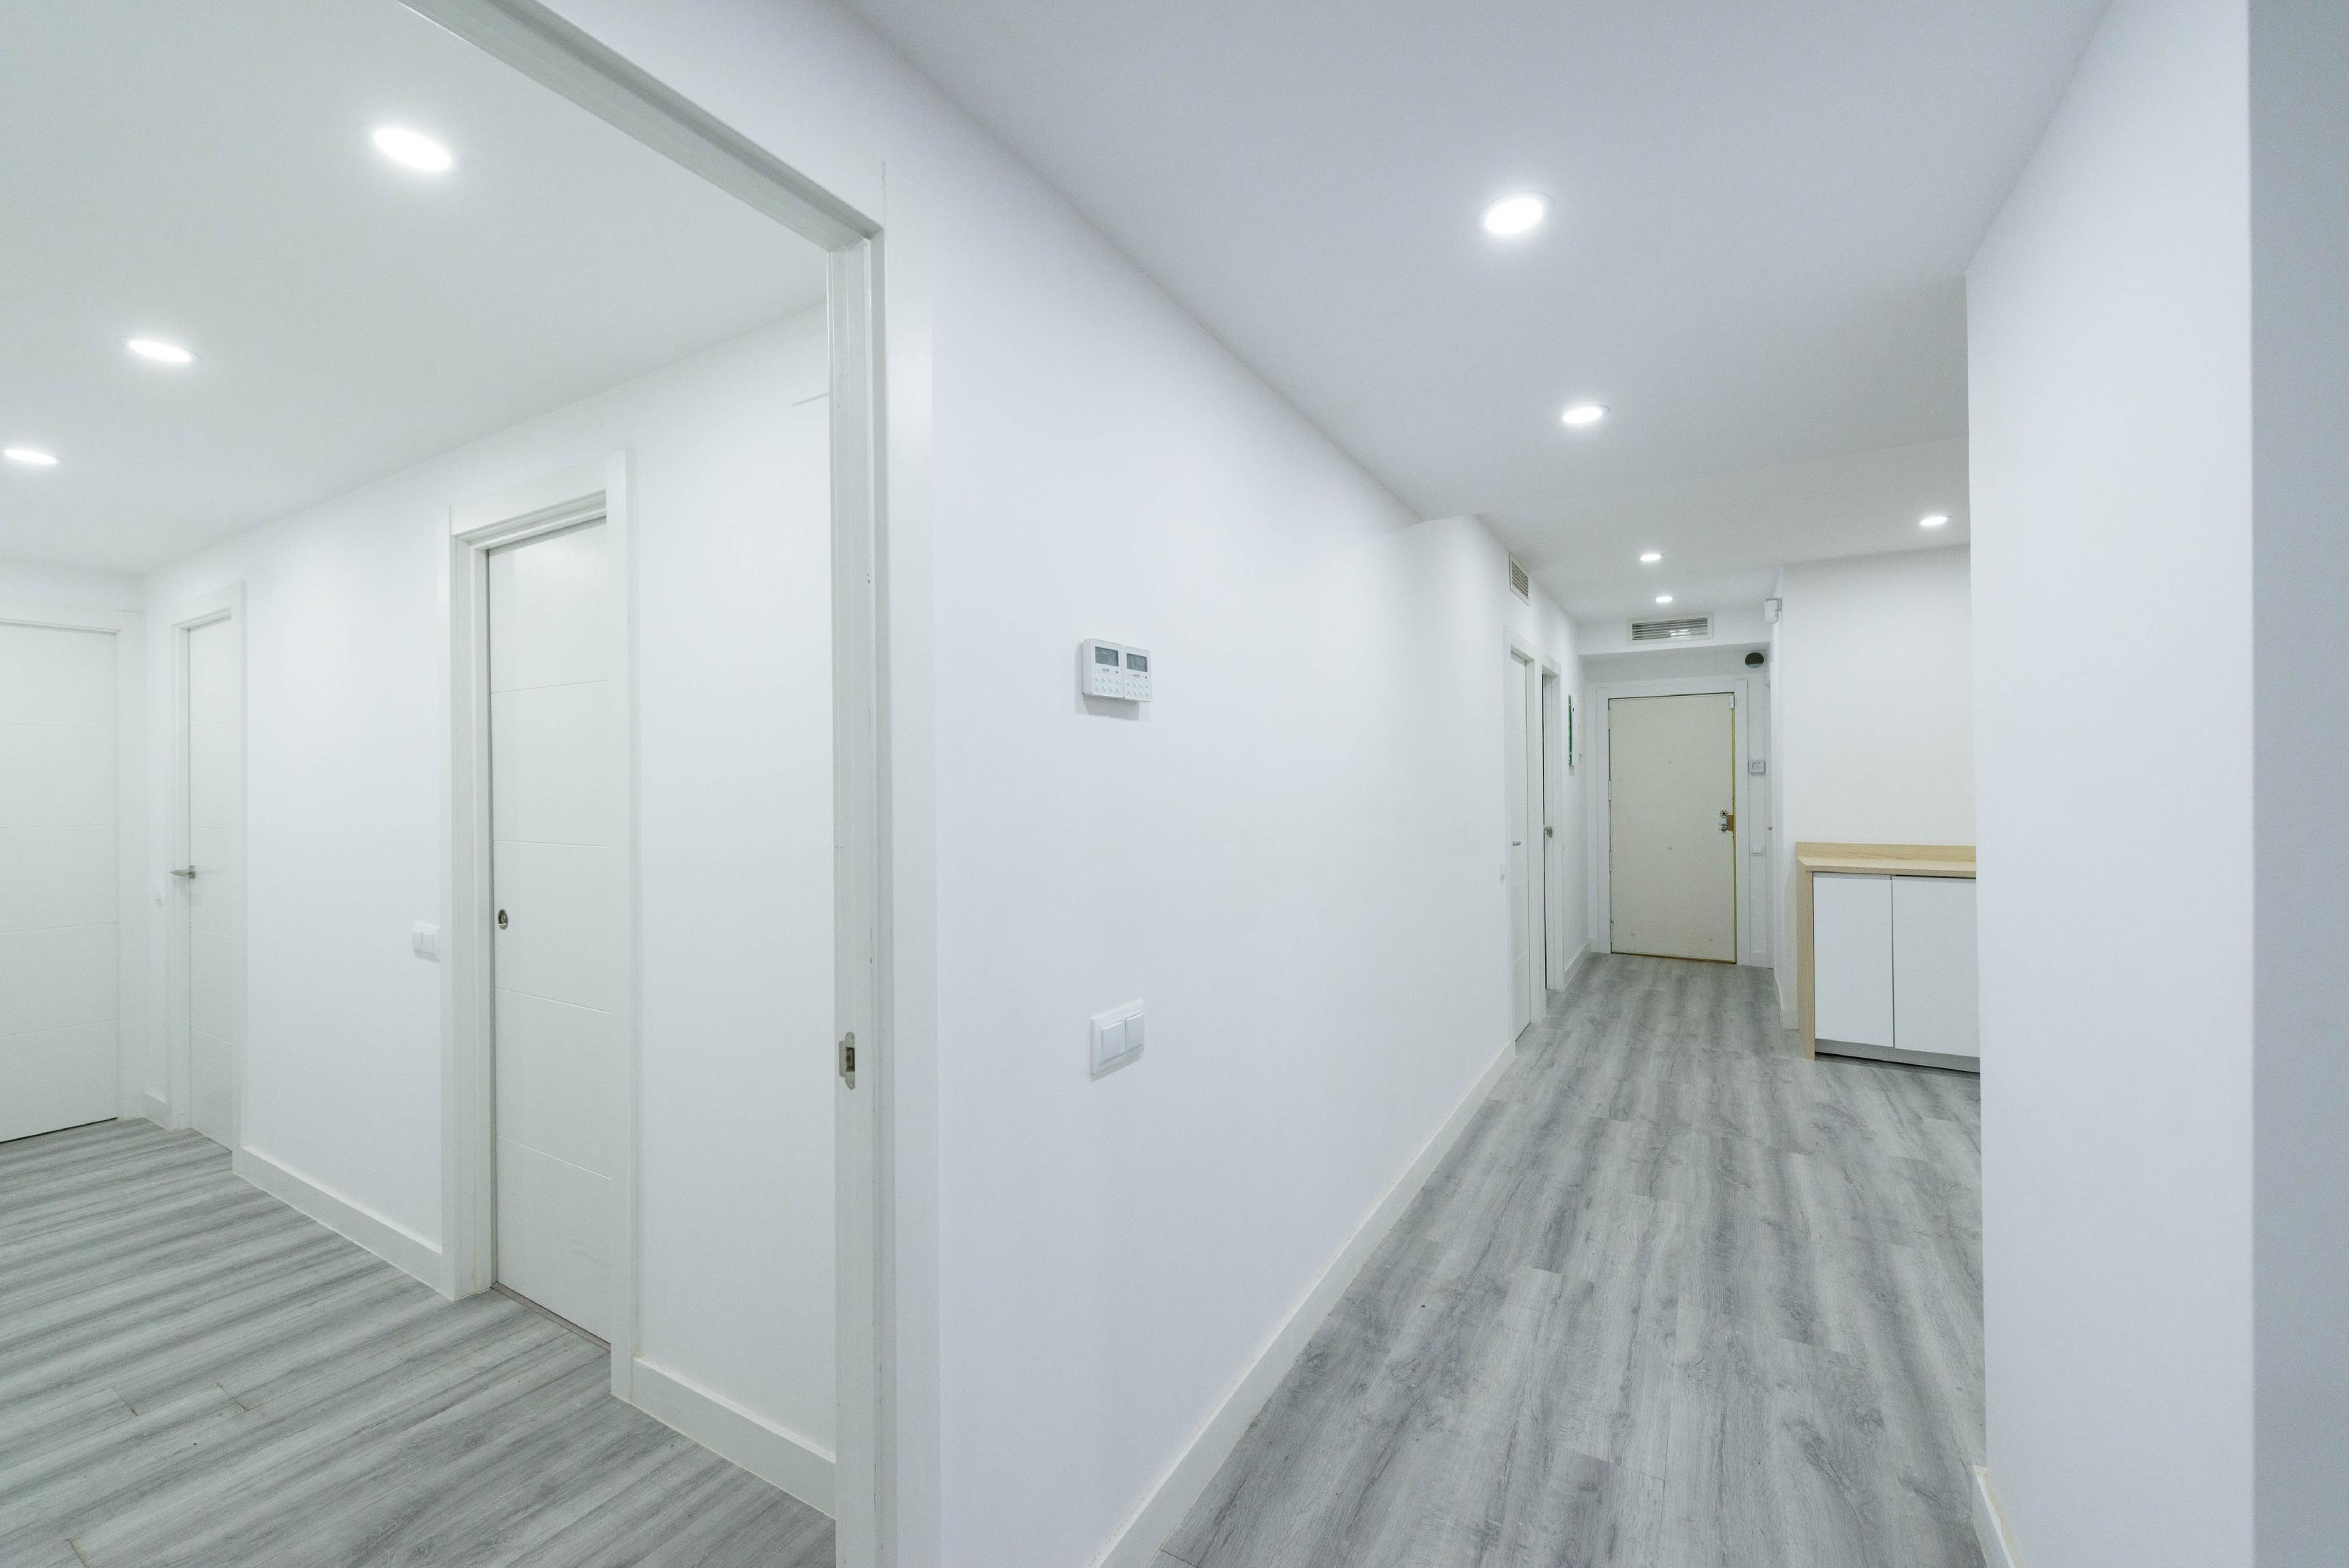 242980 Flat for sale in Eixample, Sagrada Familia 20